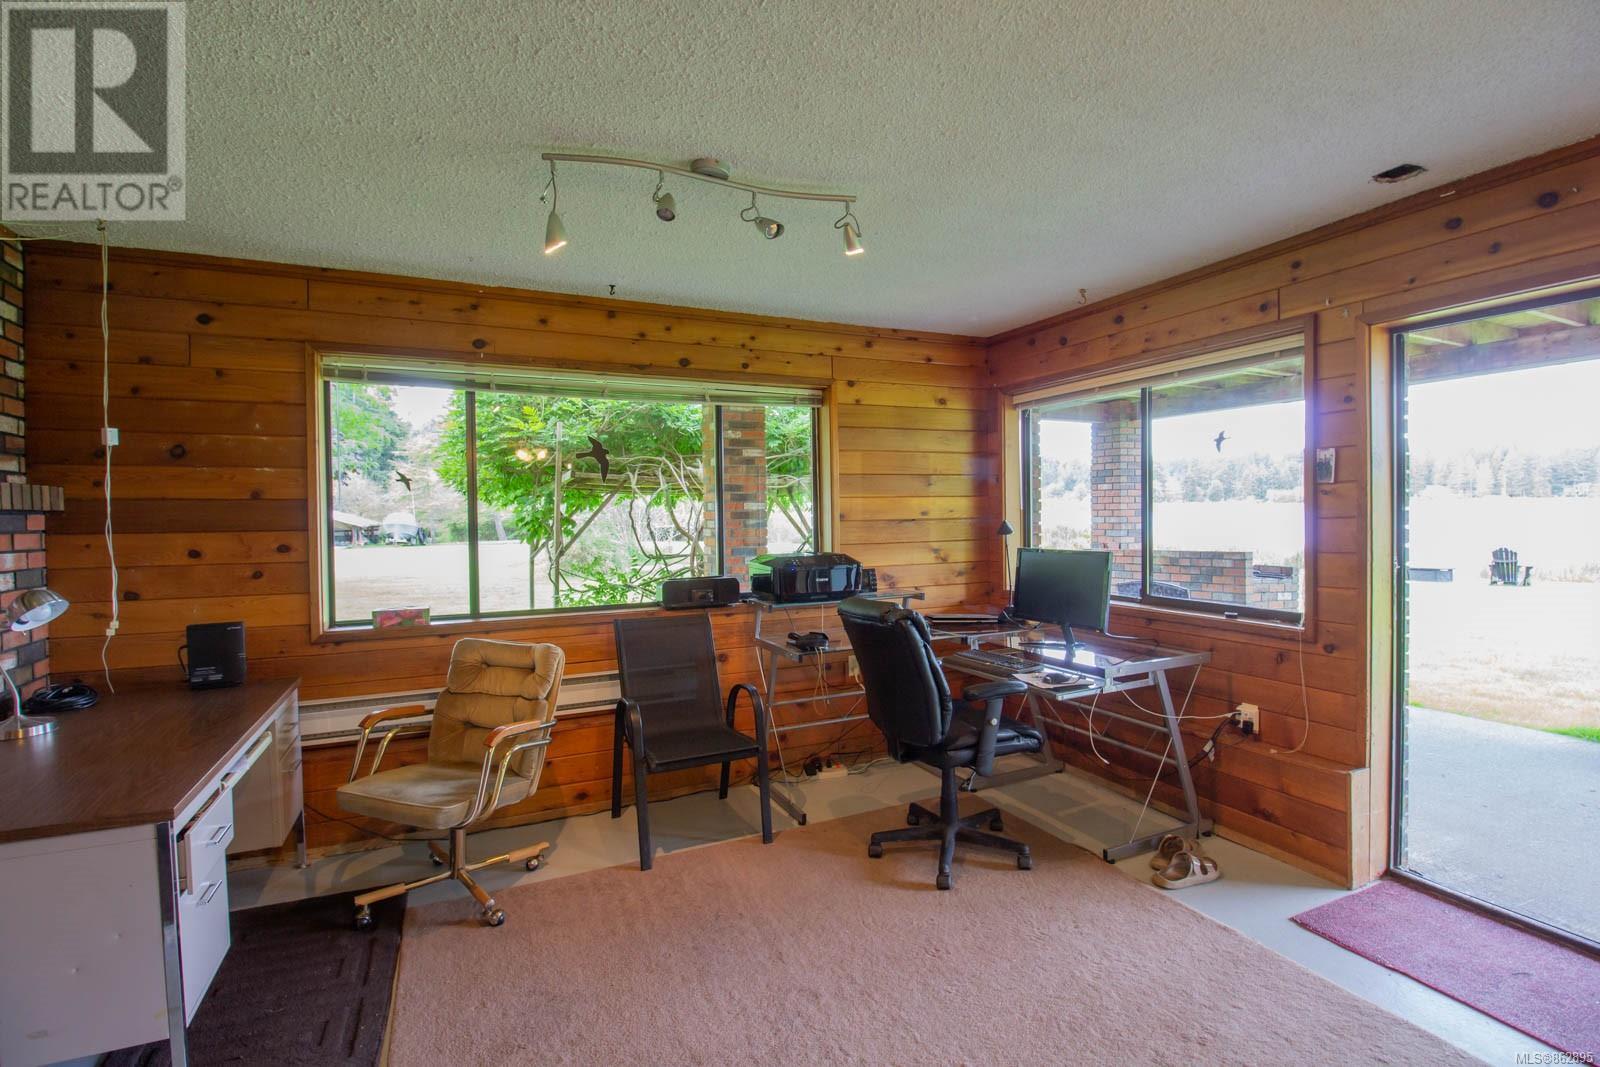 6690 Jenkins Rd, Nanaimo, British Columbia  V9T 6G8 - Photo 21 - 862895